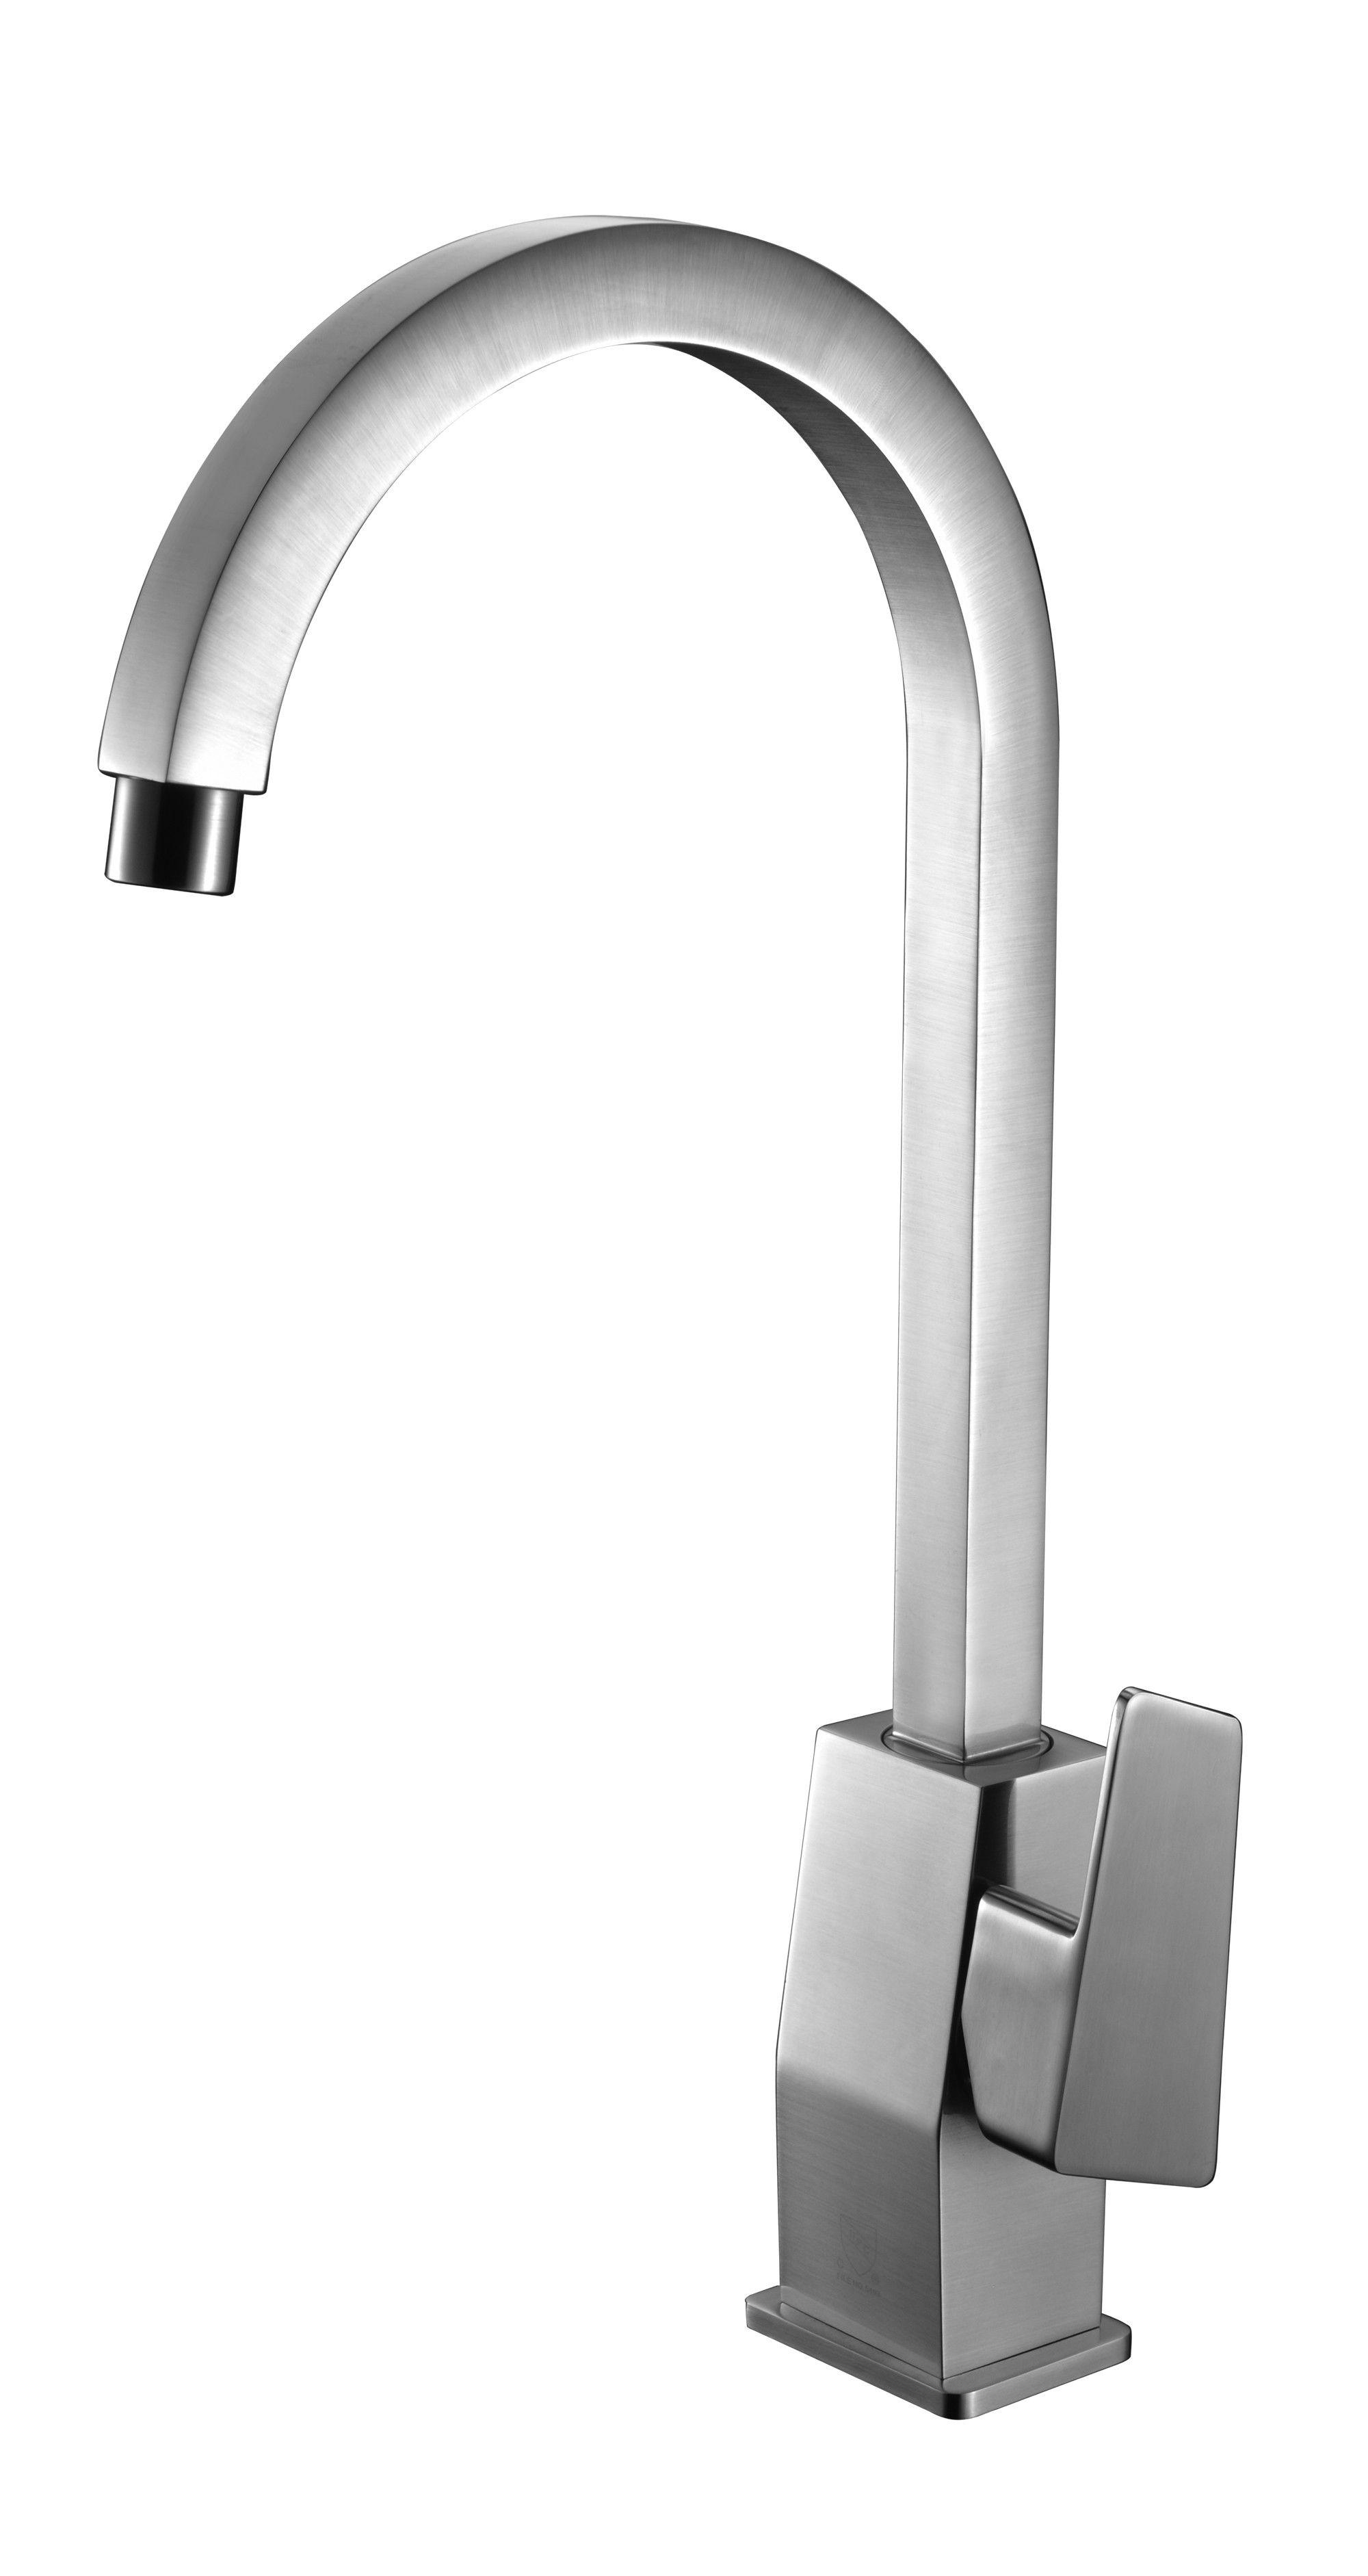 ALFI brand AB3470-BN Brushed Nickel Gooseneck Single Hole Bathroom ...